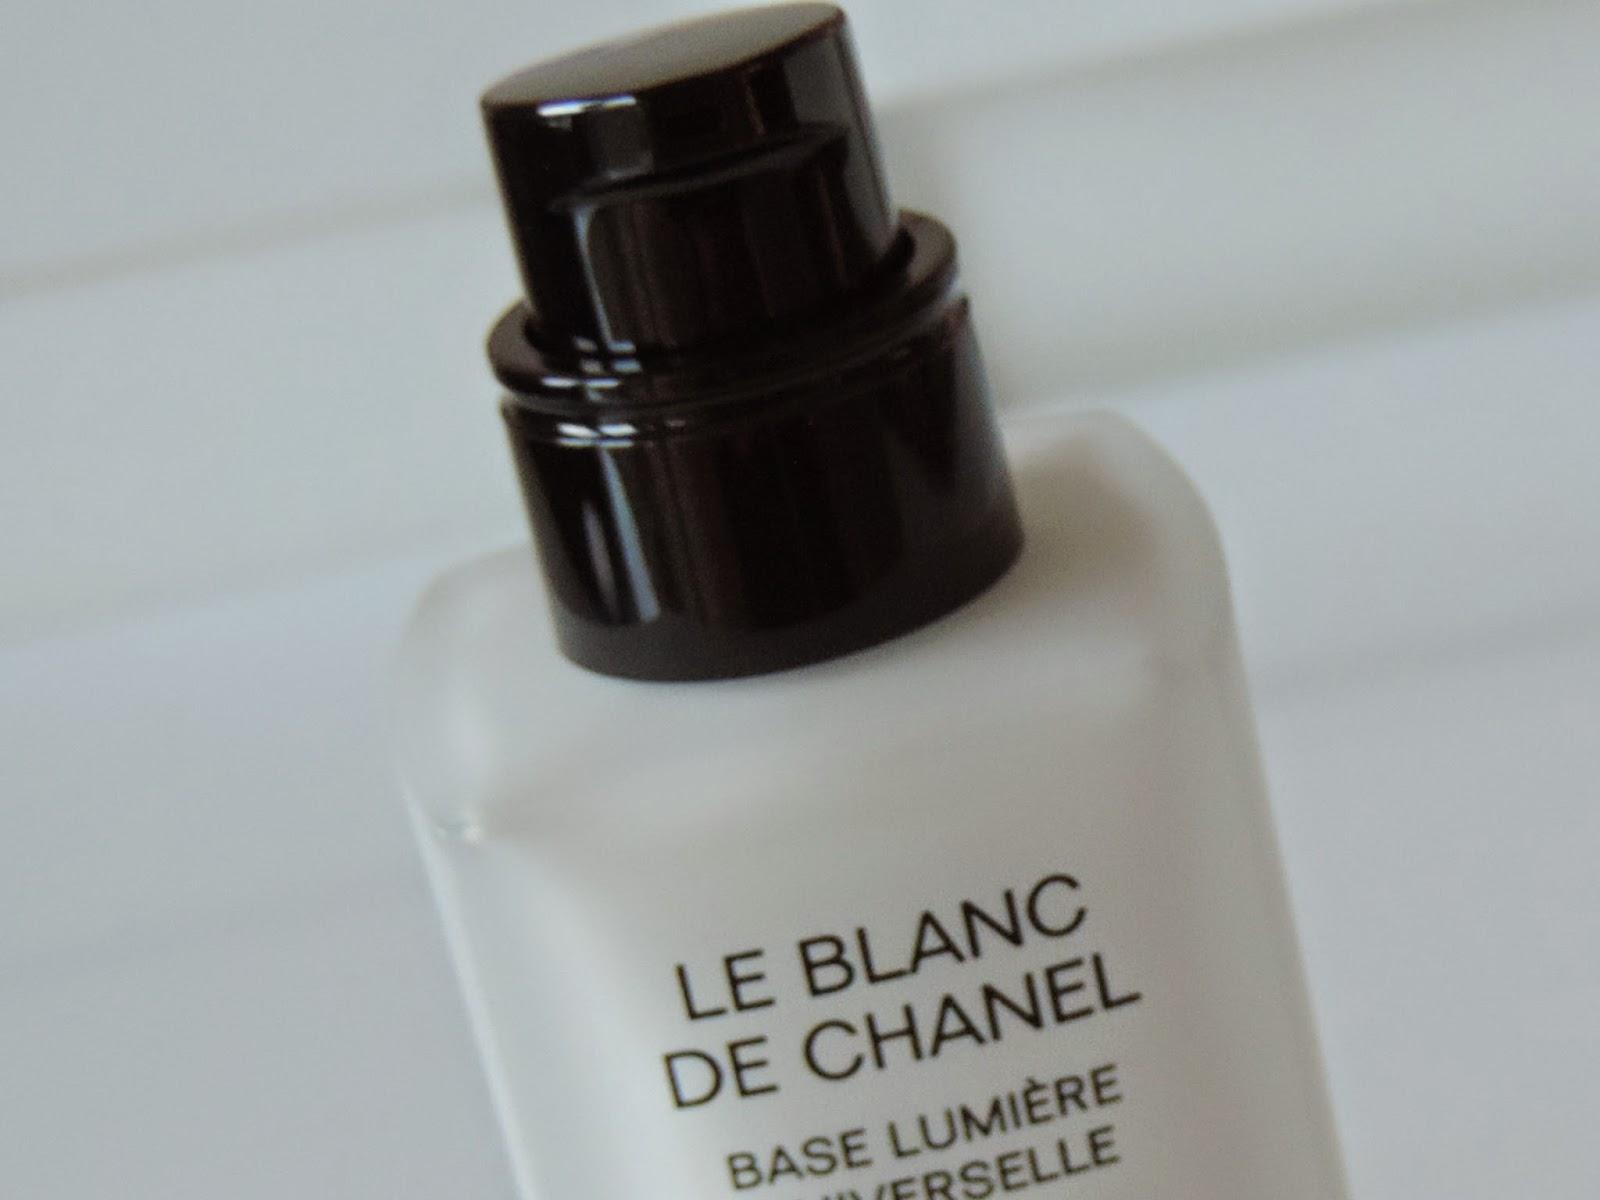 De Multi Use Illuminating Base by Chanel #16